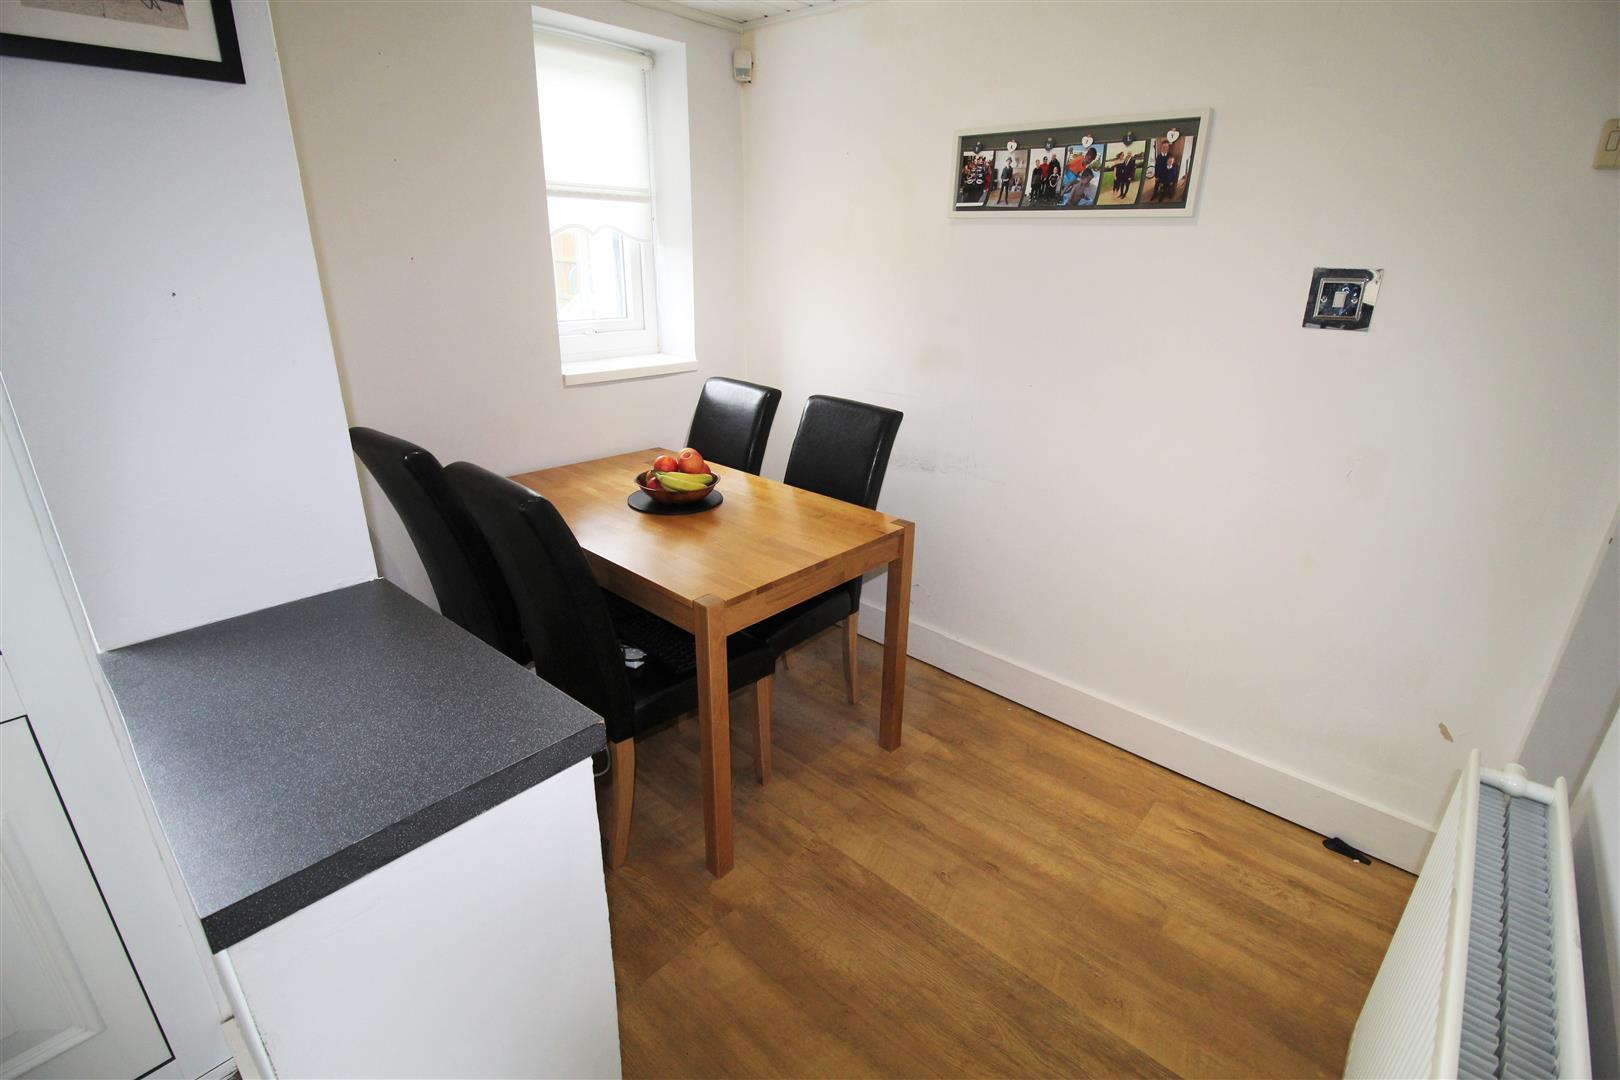 3 Bedrooms, House - Semi-Detached, Oriel Close, Aintree Village, Liverpool